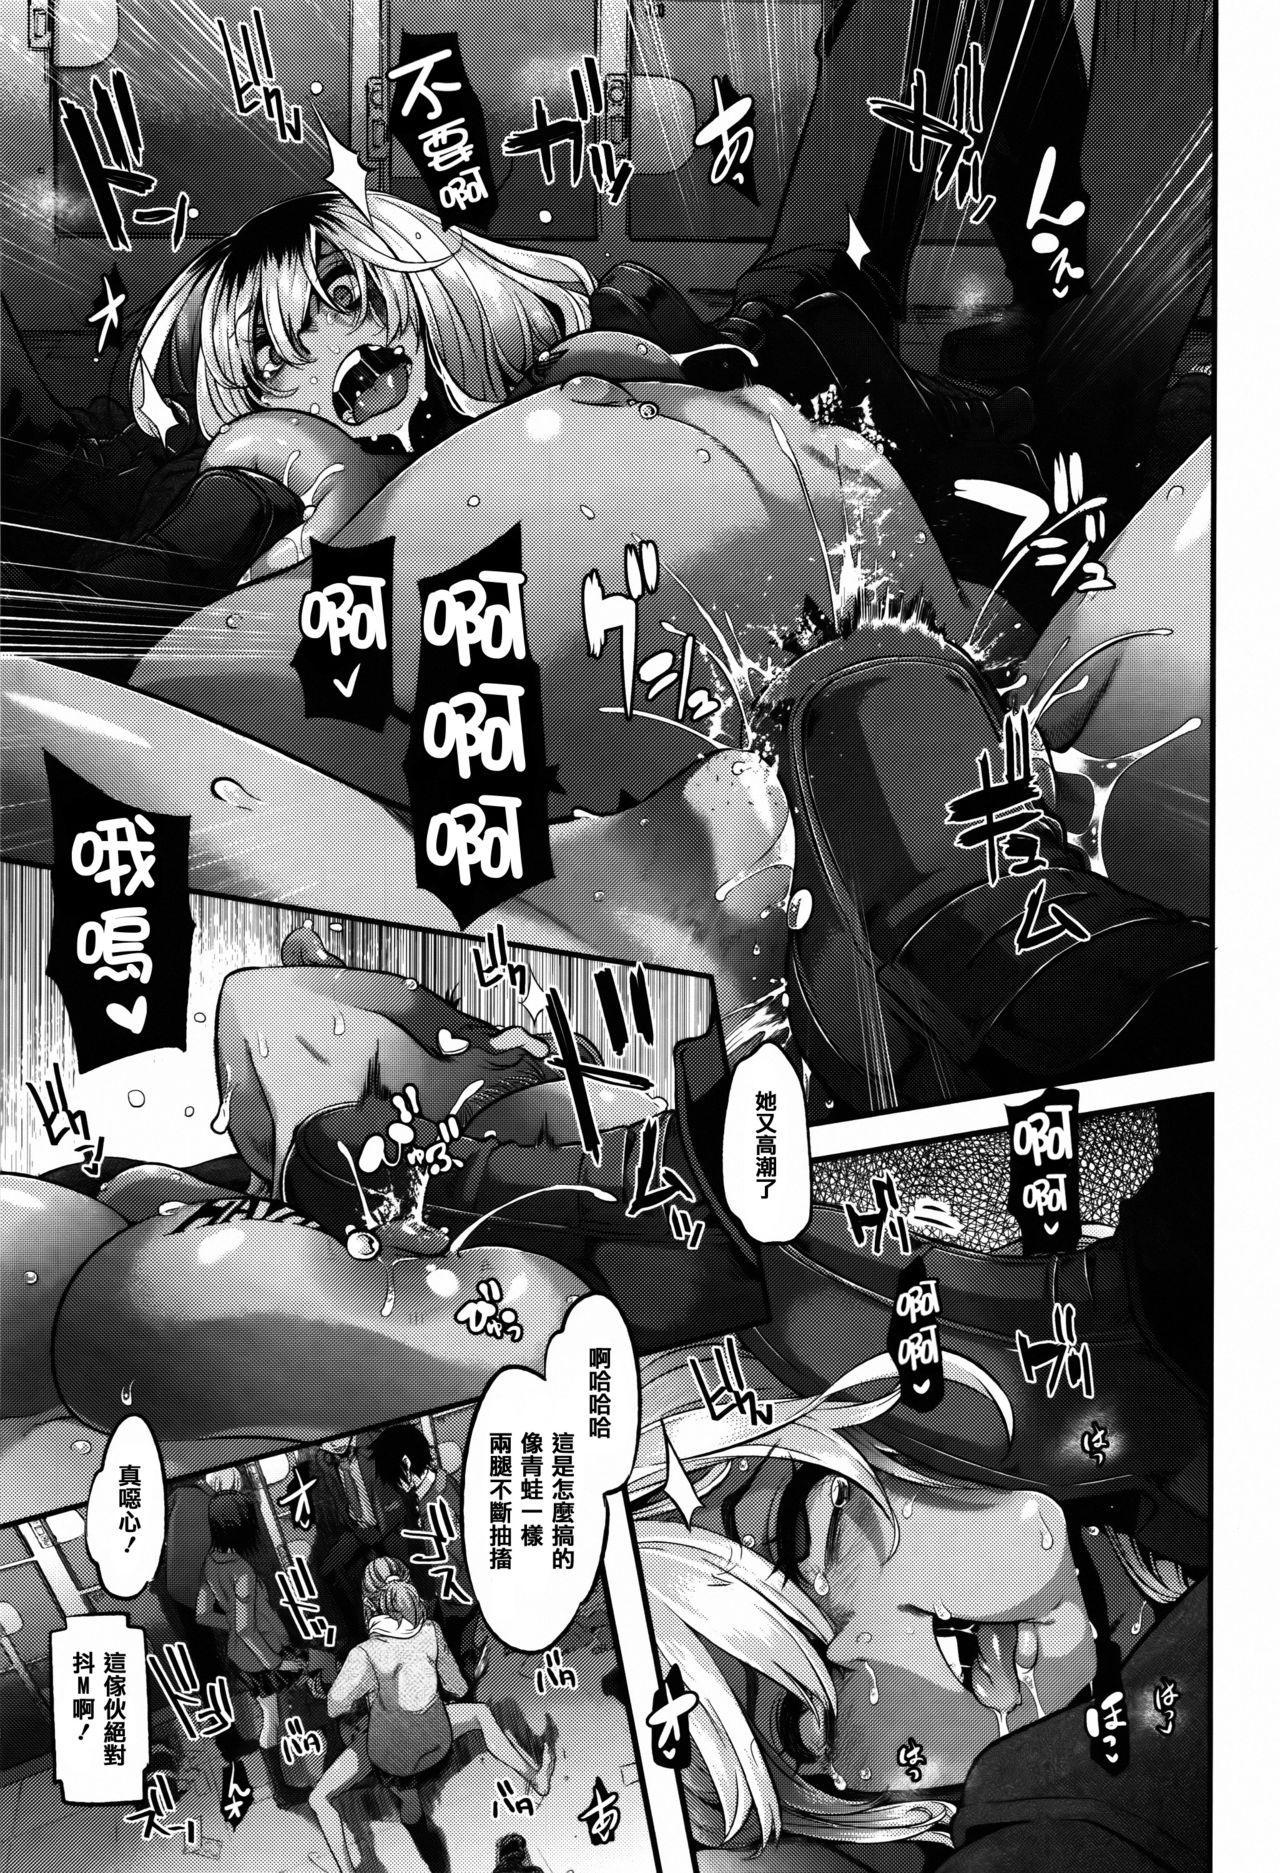 Henshin + 4P leaflet 230